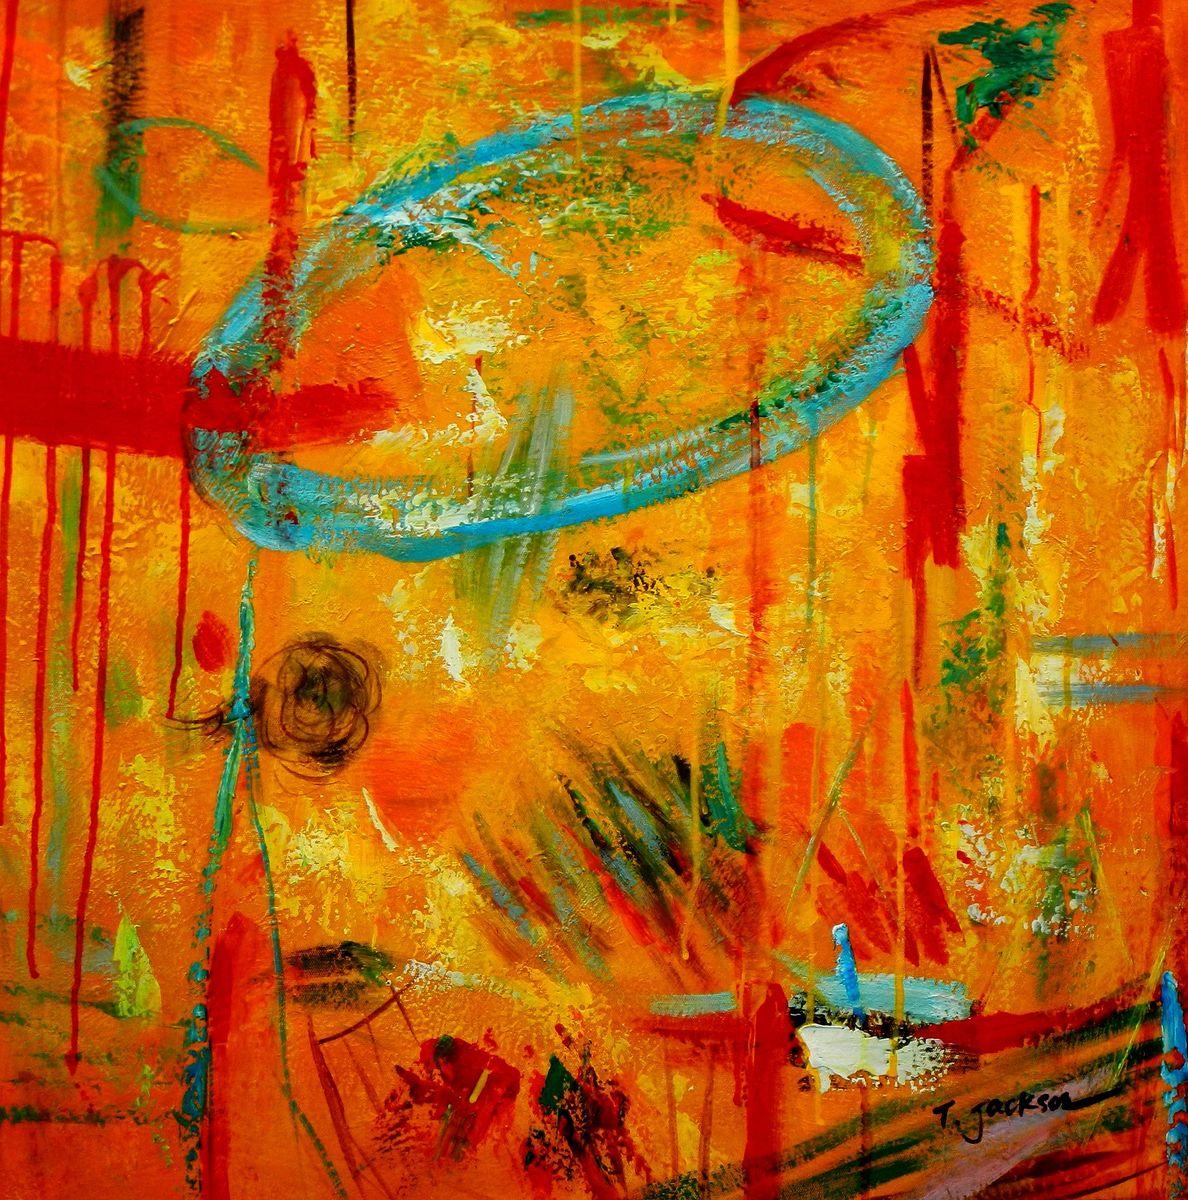 Abstract - The Angola wildlife II e96697 60x60cm abstraktes Ölbild